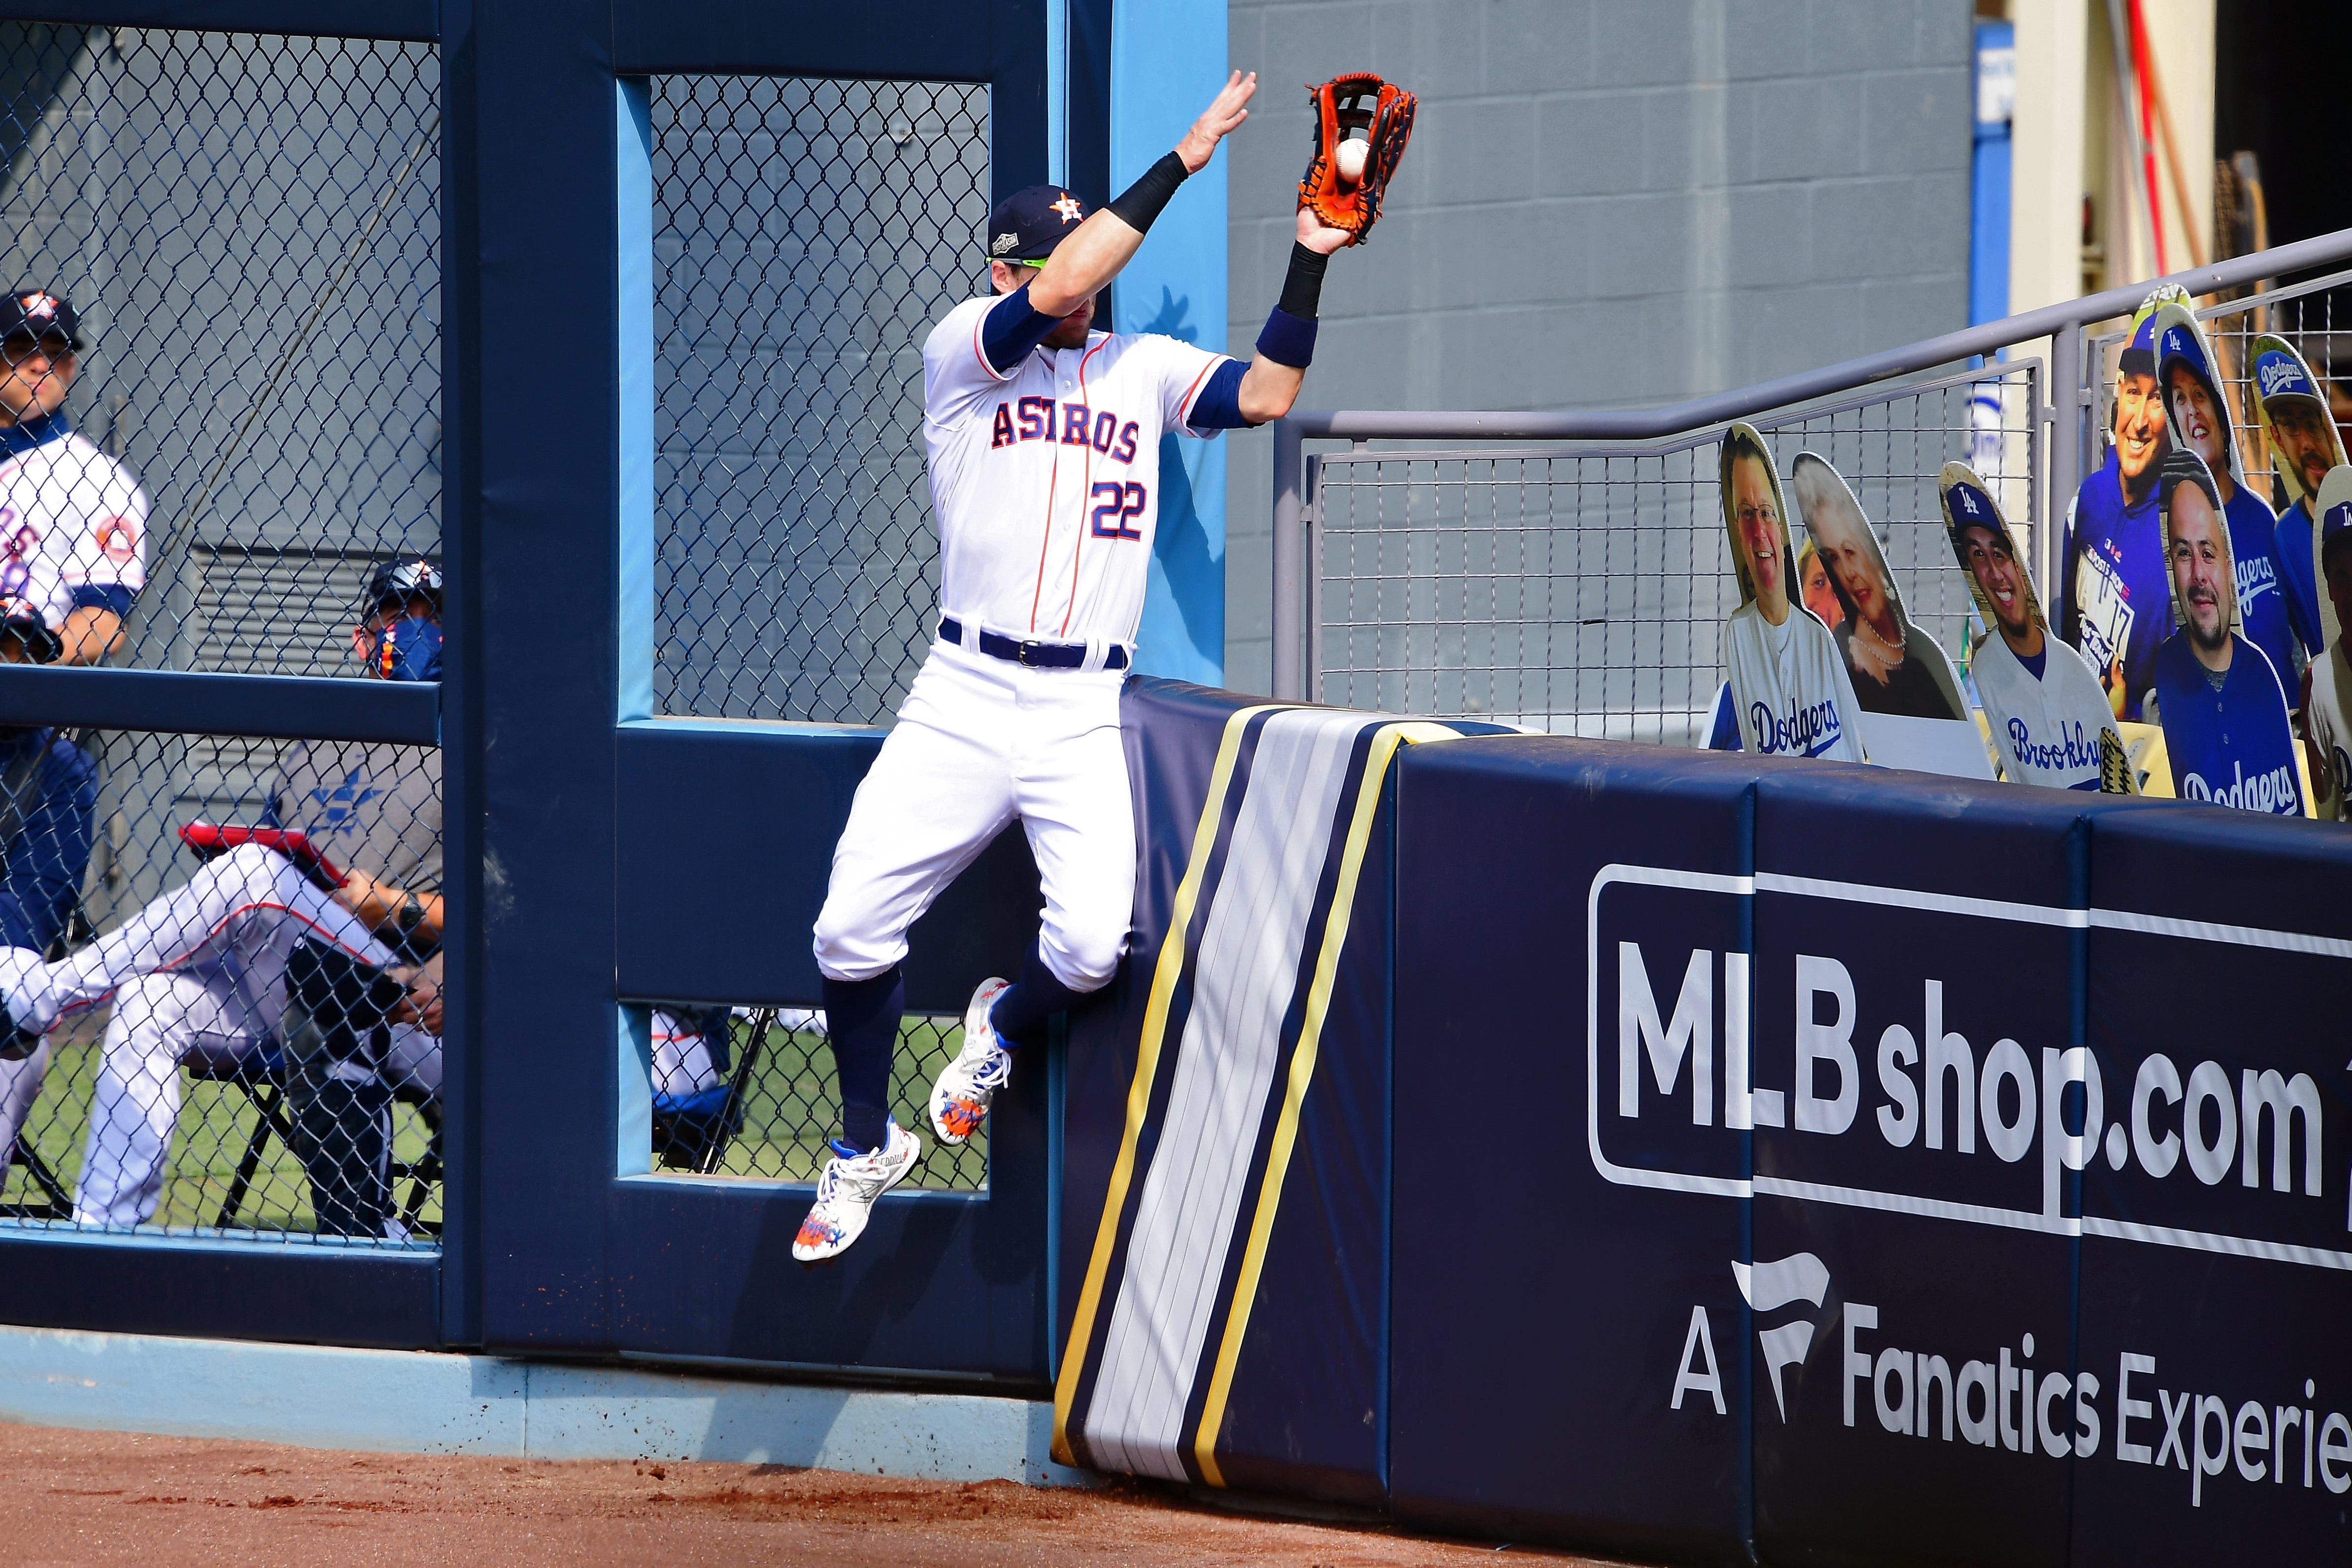 Photos: Astros' Josh Reddick robs homer with crazy catch